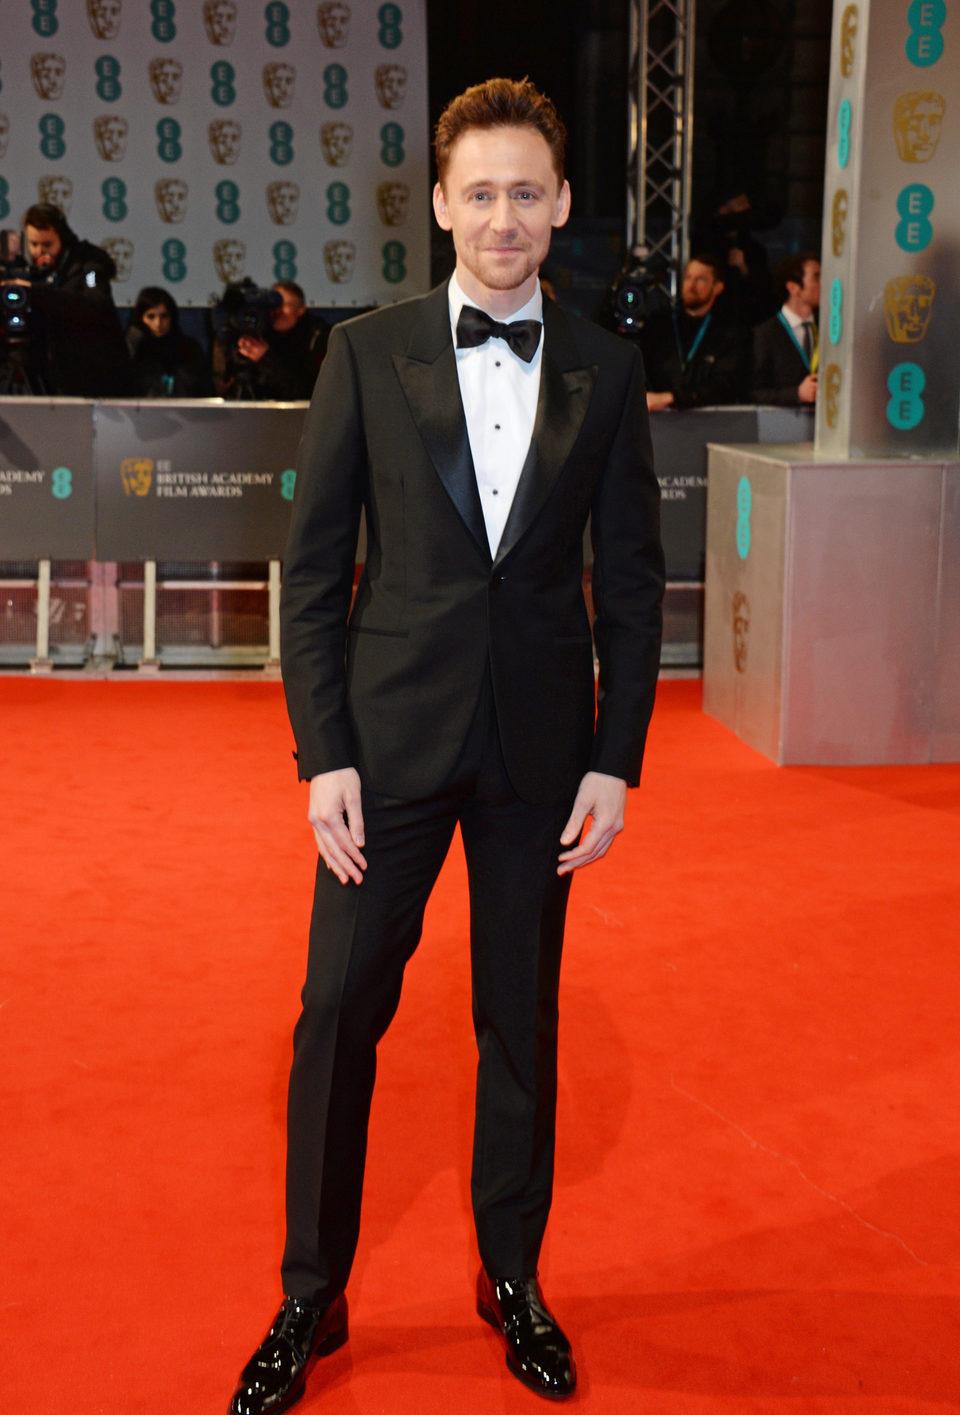 Tom Hiddleston en los BAFTA 2015